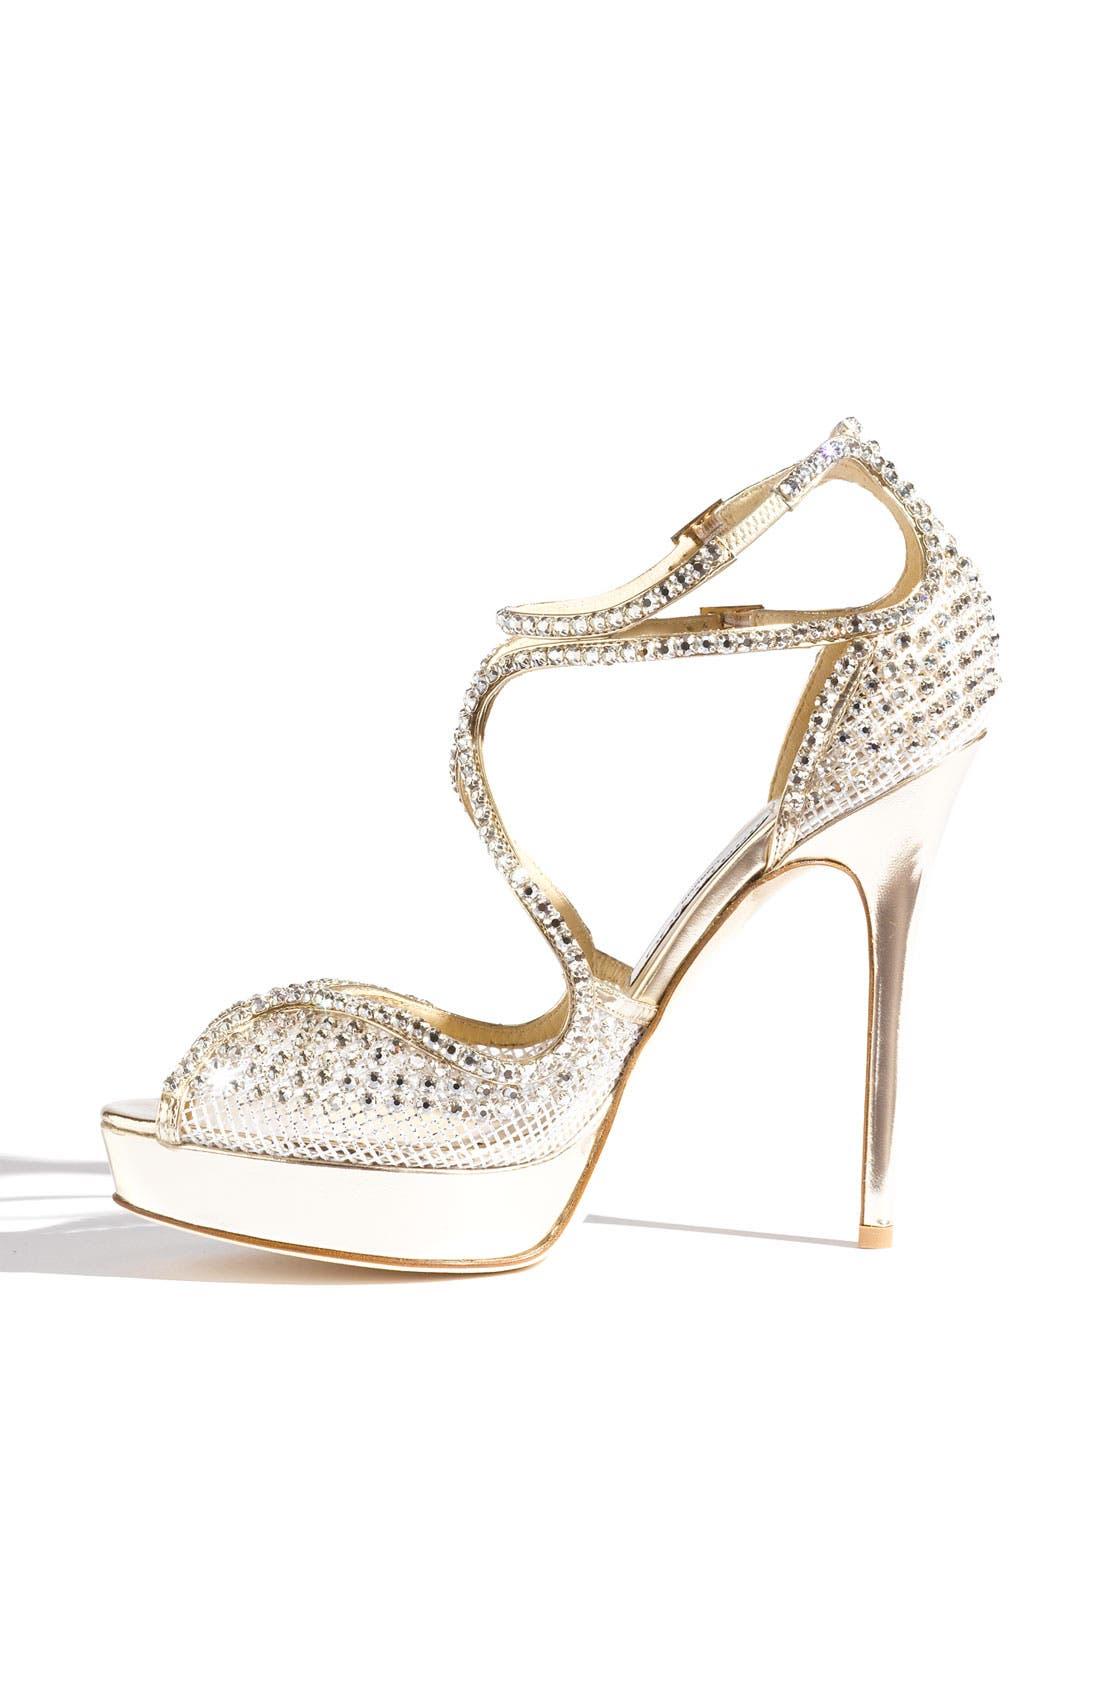 'Fairview' Crystal Embellished Sandal,                             Alternate thumbnail 3, color,                             040